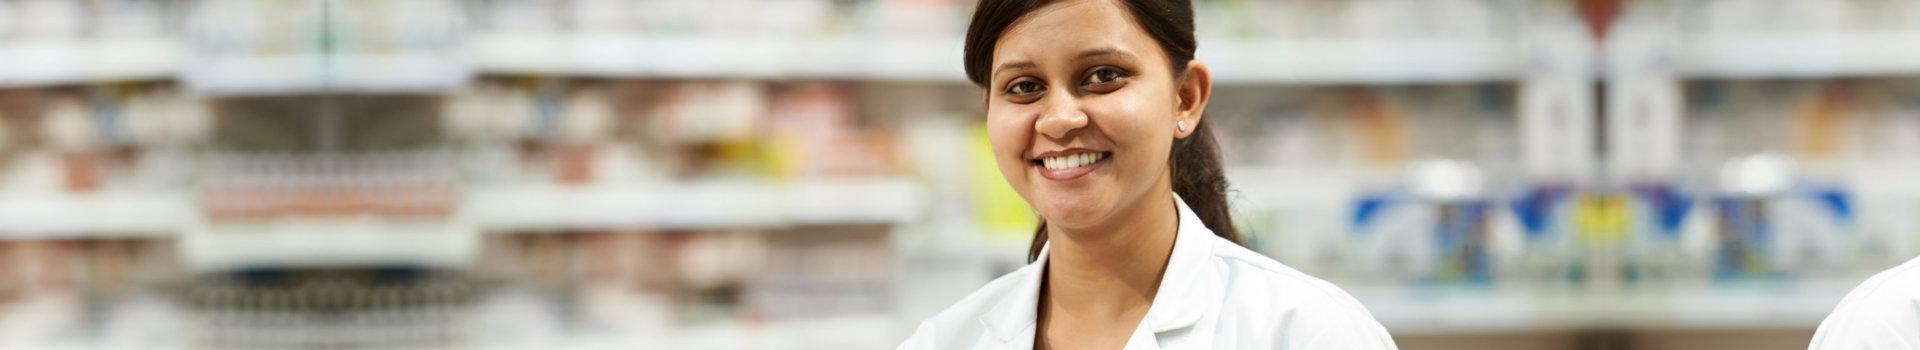 pharmacist doing medicines inventory